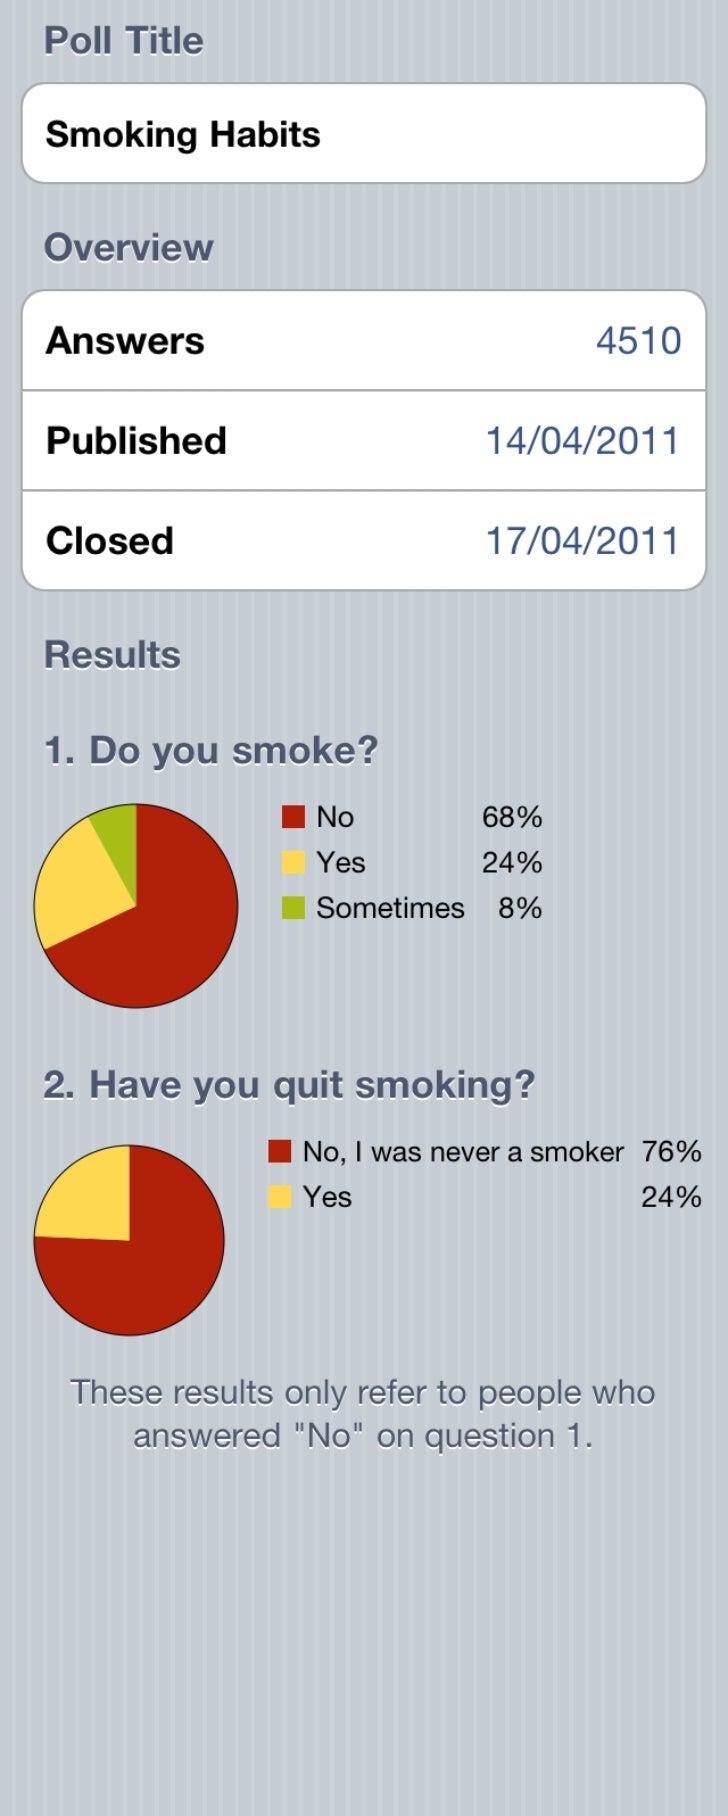 Smoking a cultural habit